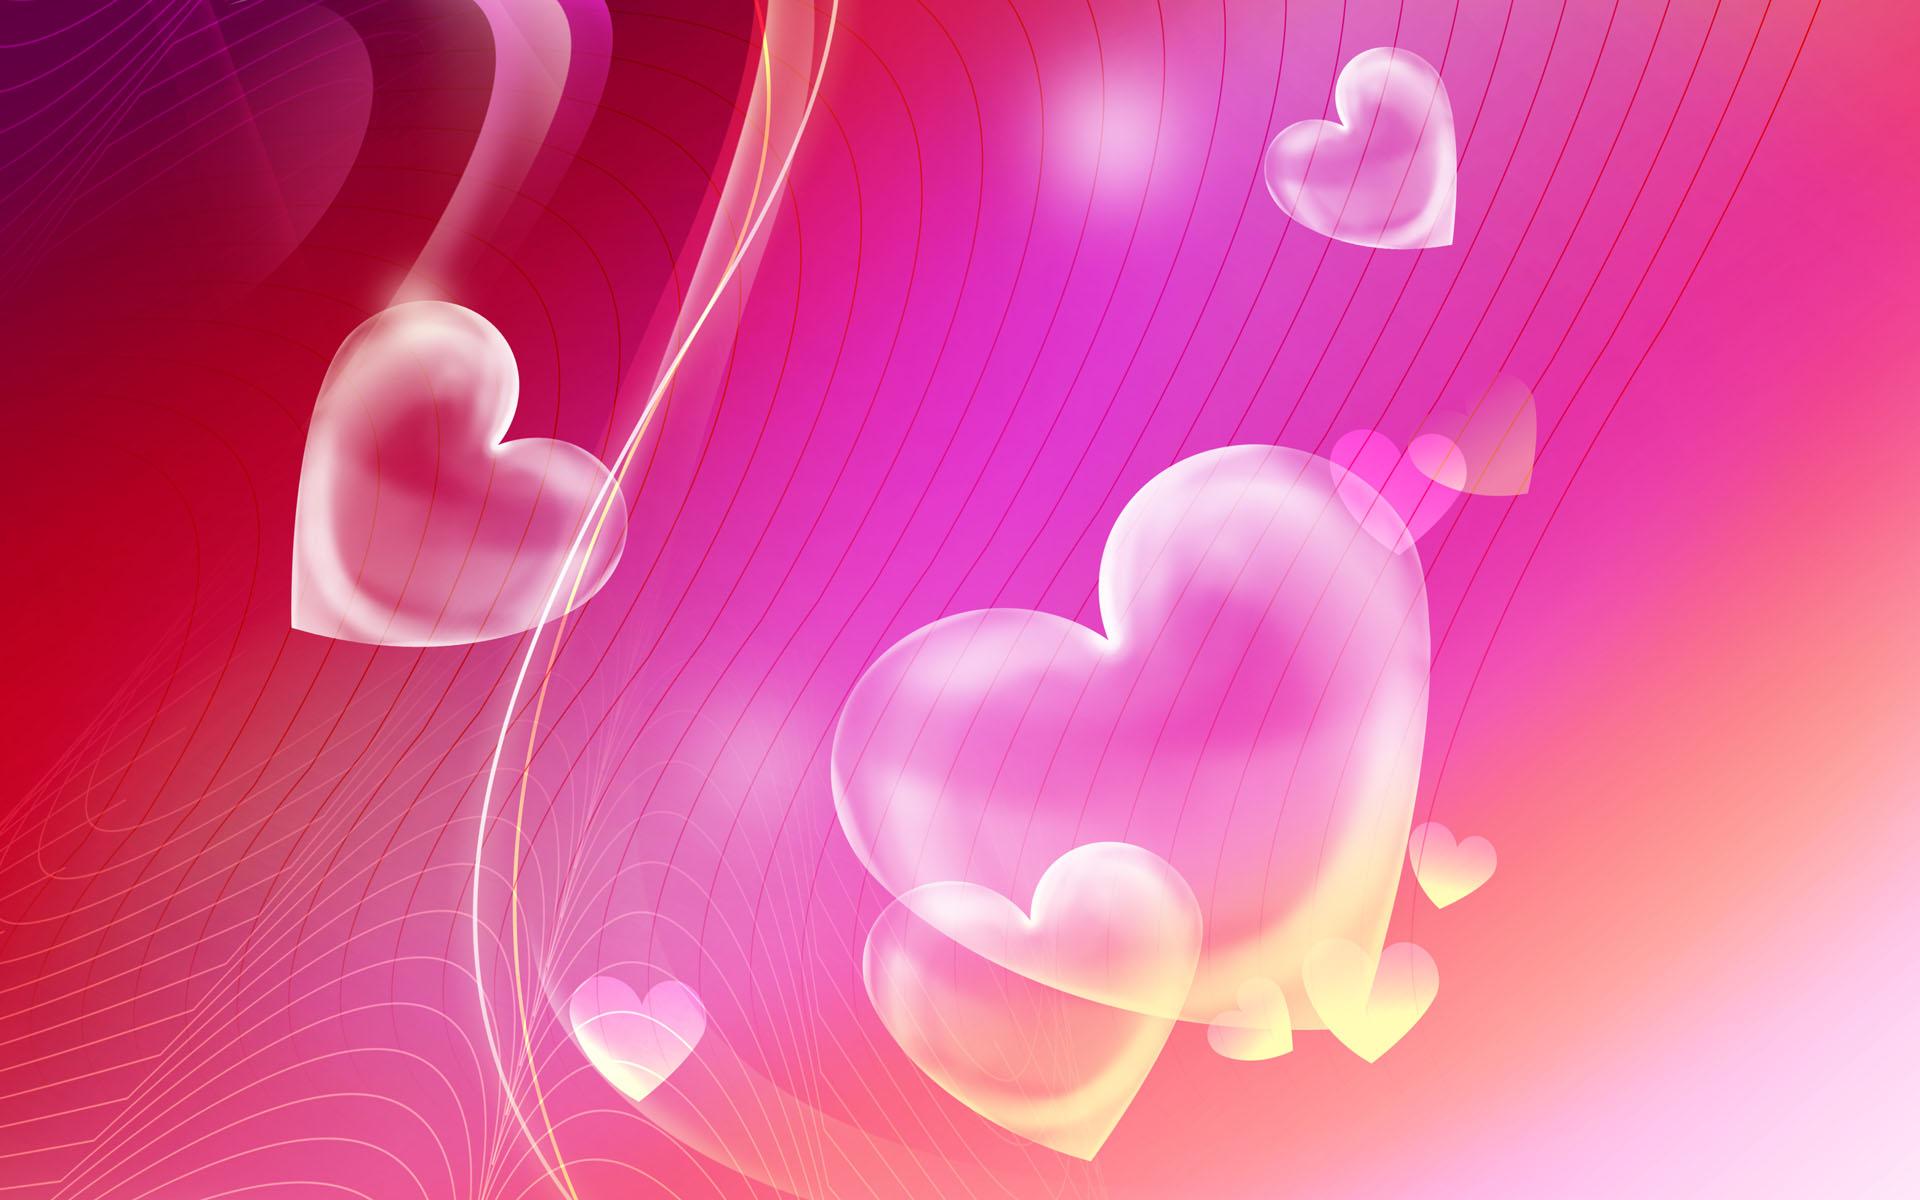 Картинки на телефон яркие сердечки